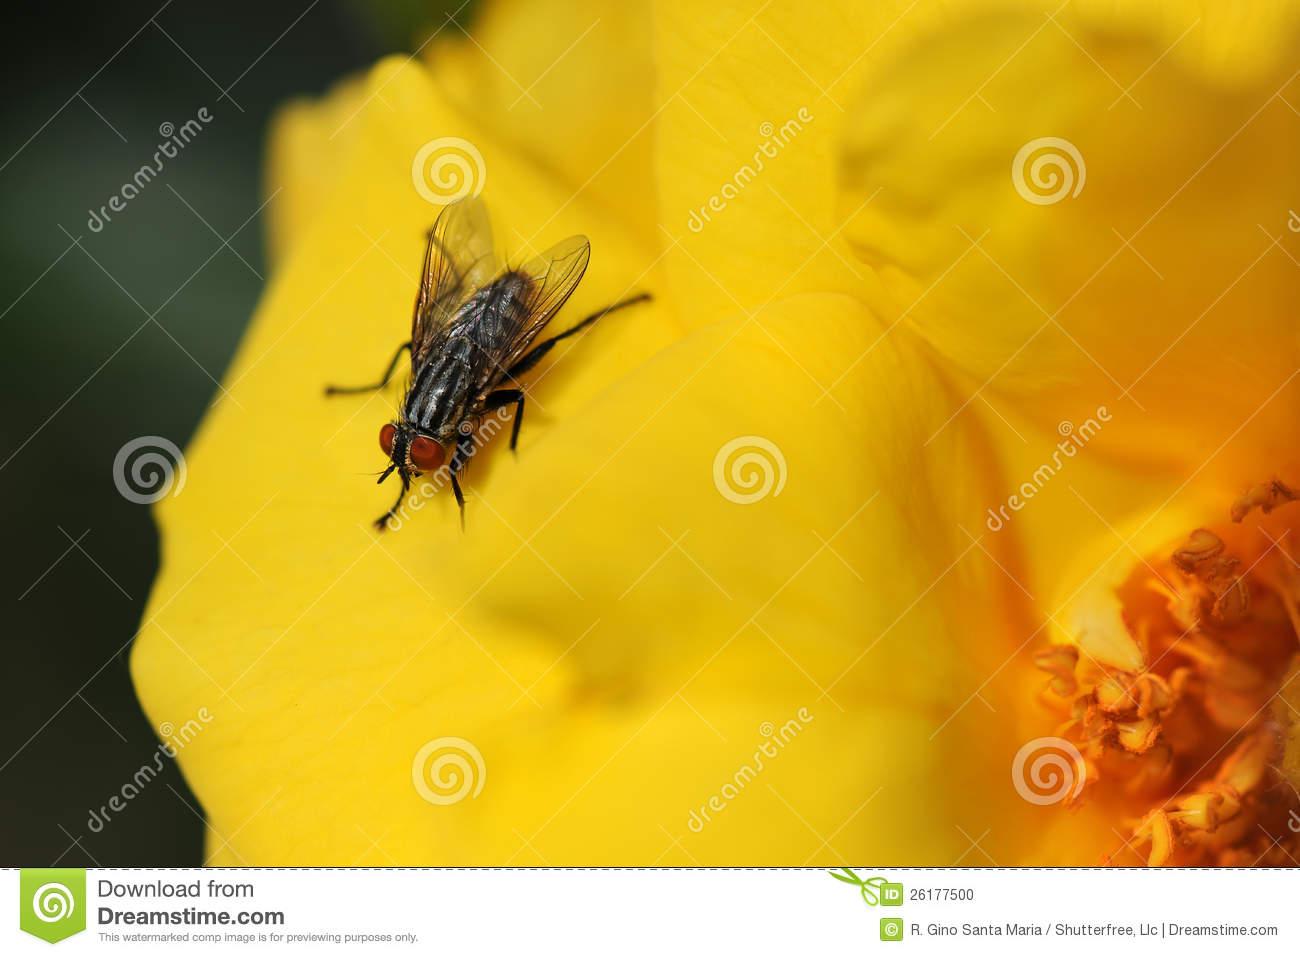 yellow wallpaper 33 - photo #30